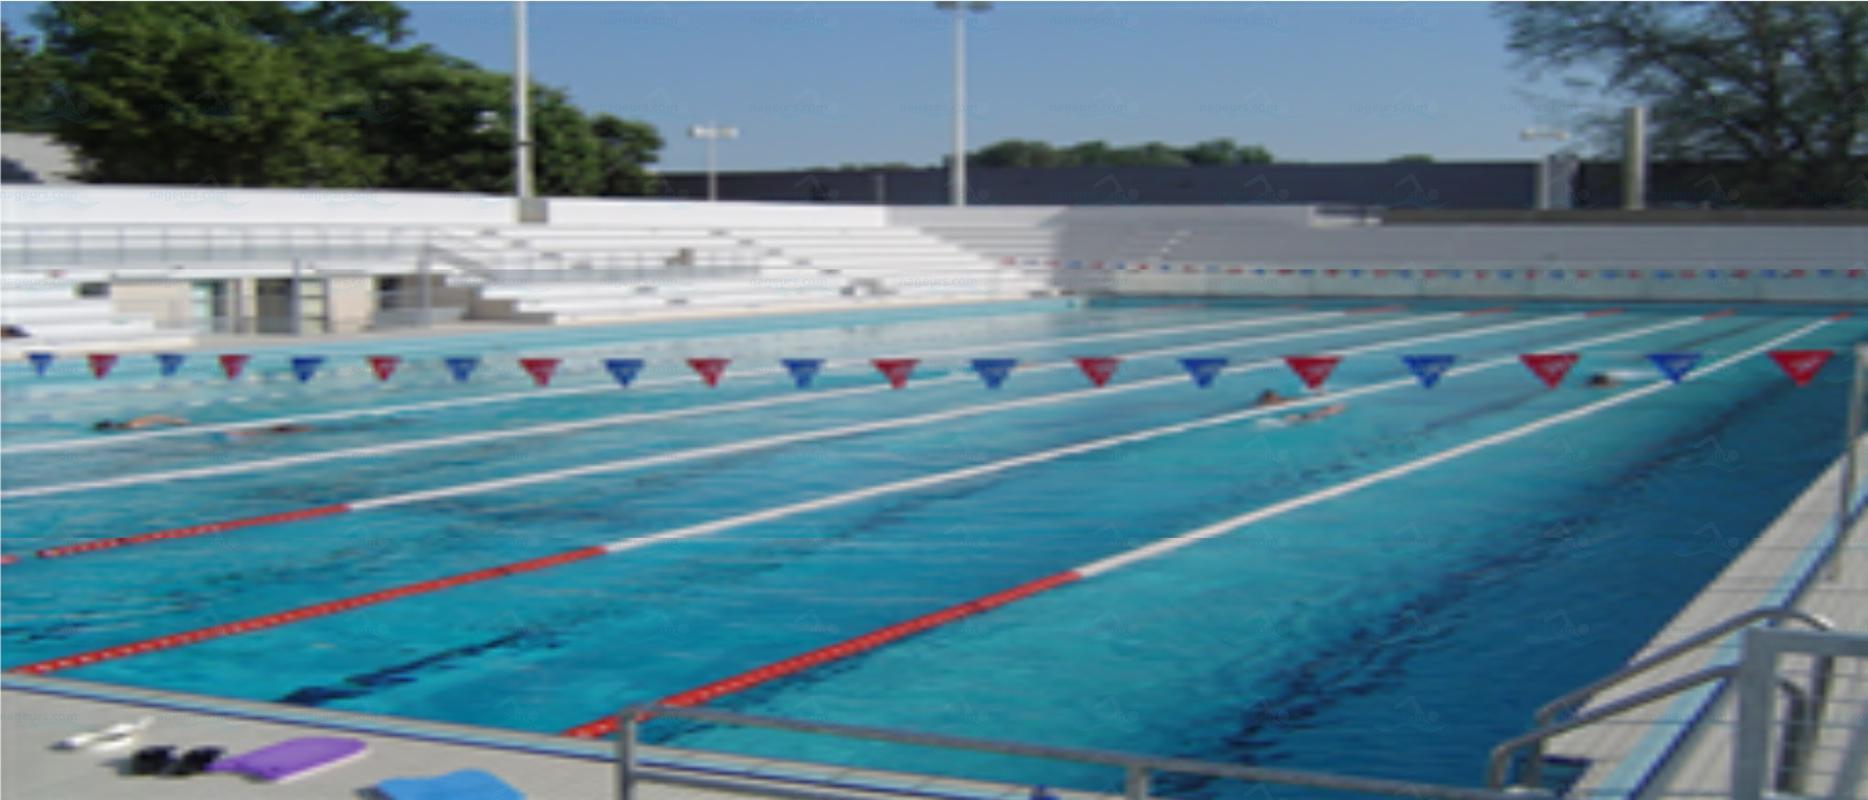 Piscines france midi pyr n es les piscines haute for Alex jany piscine